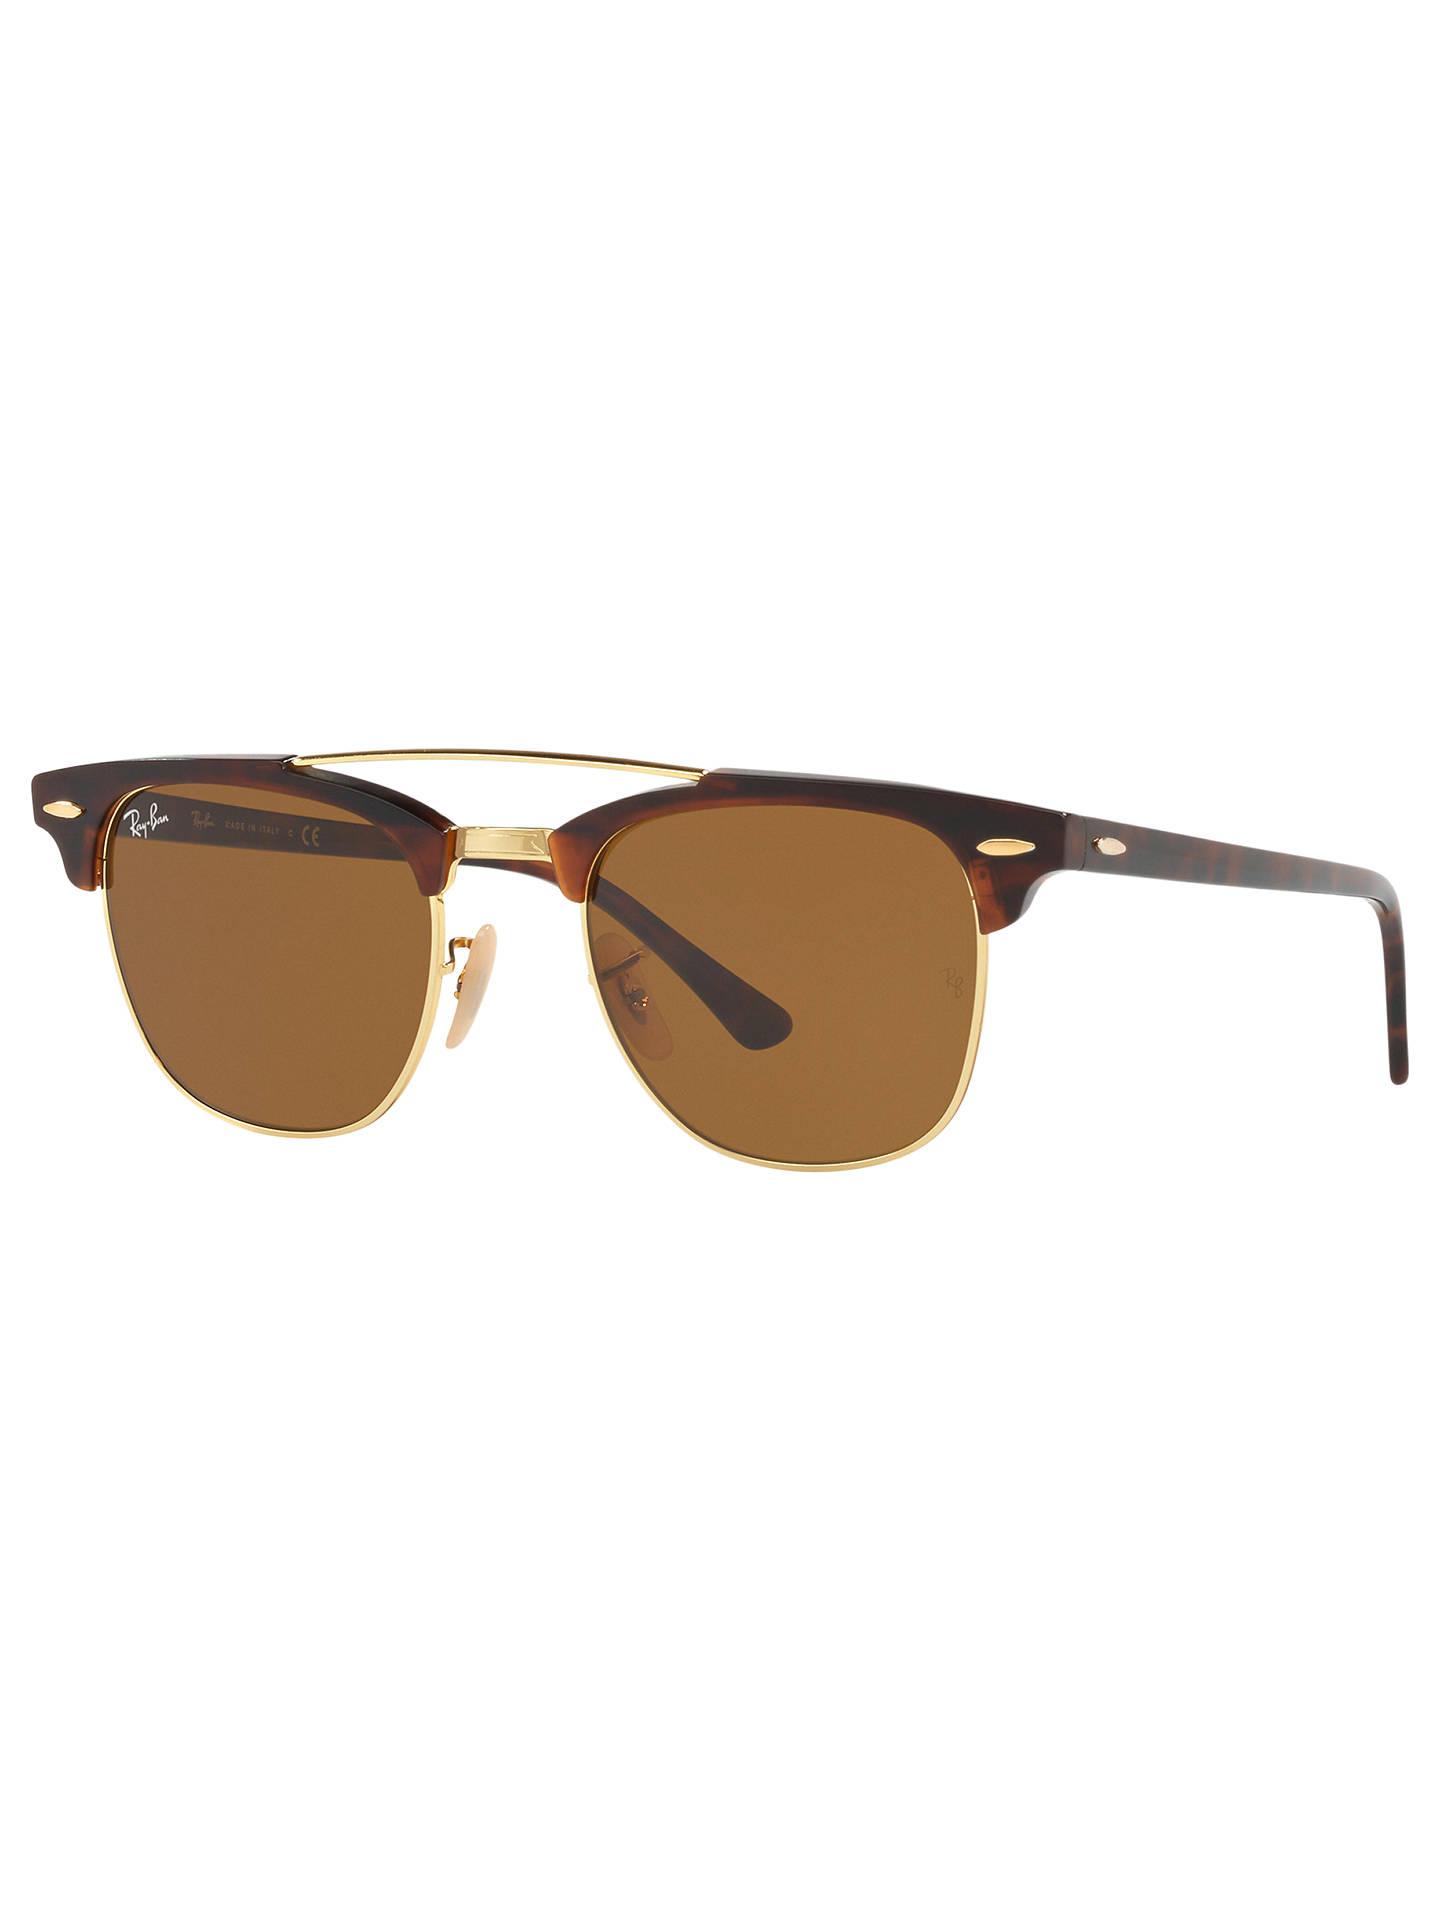 994f53ef2bc Buy Ray-Ban RB3816 Unisex Wayfarer Sunglasses